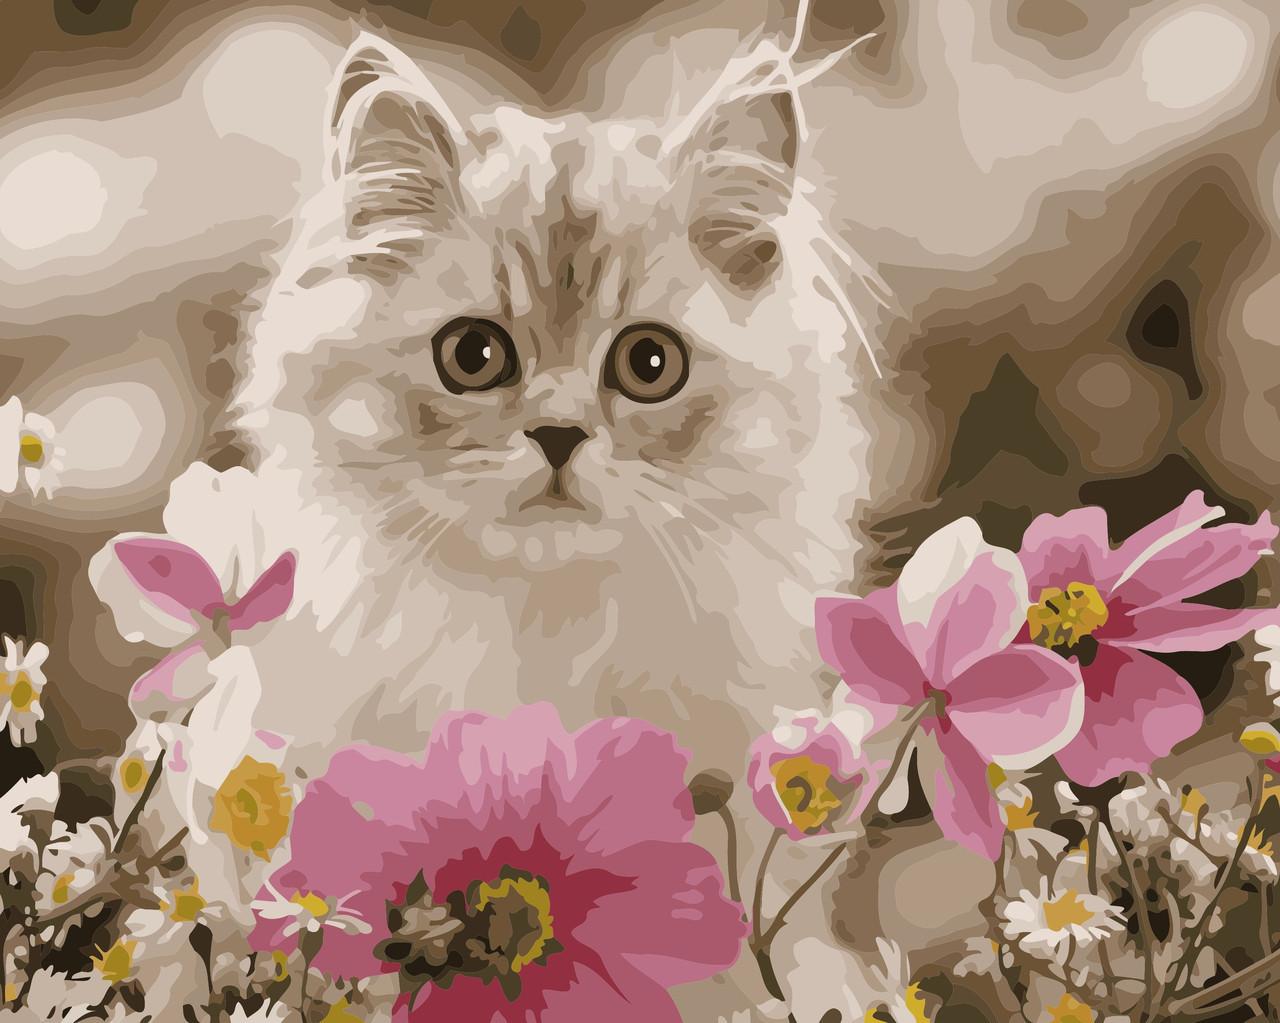 Картина по номерам Среди цветов 30 х 40 см (AS0476)